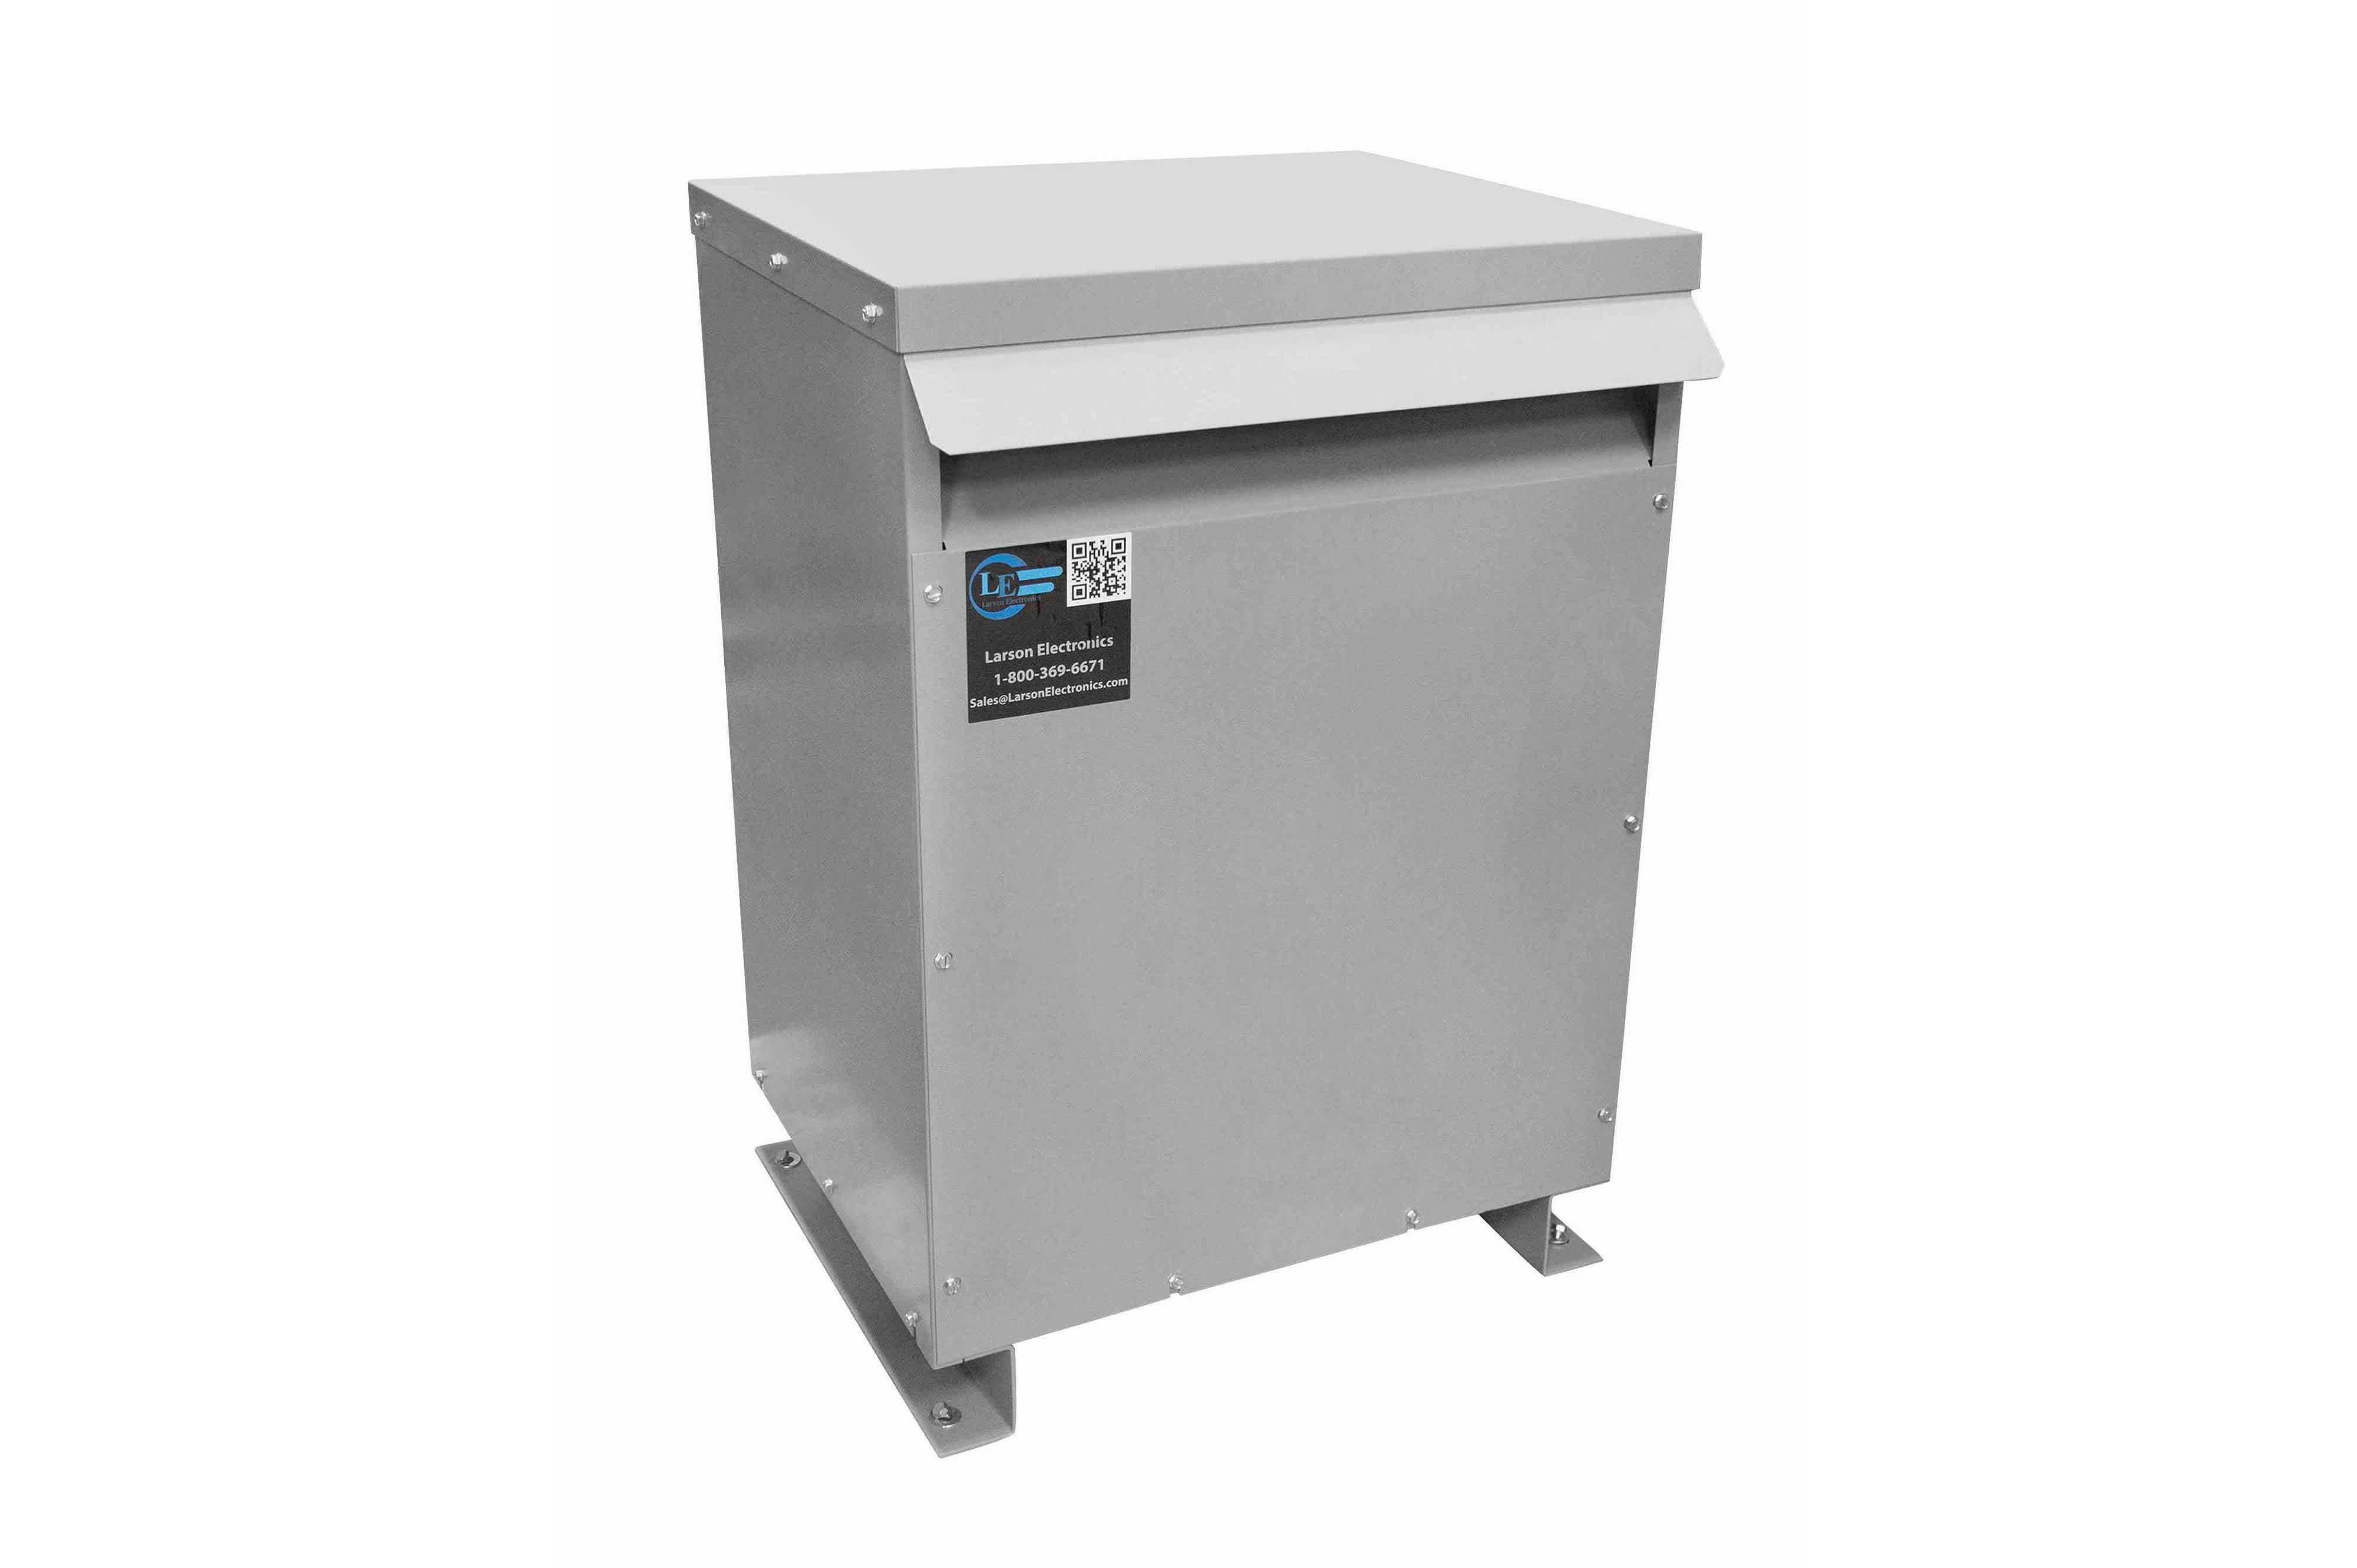 700 kVA 3PH Isolation Transformer, 240V Wye Primary, 208Y/120 Wye-N Secondary, N3R, Ventilated, 60 Hz